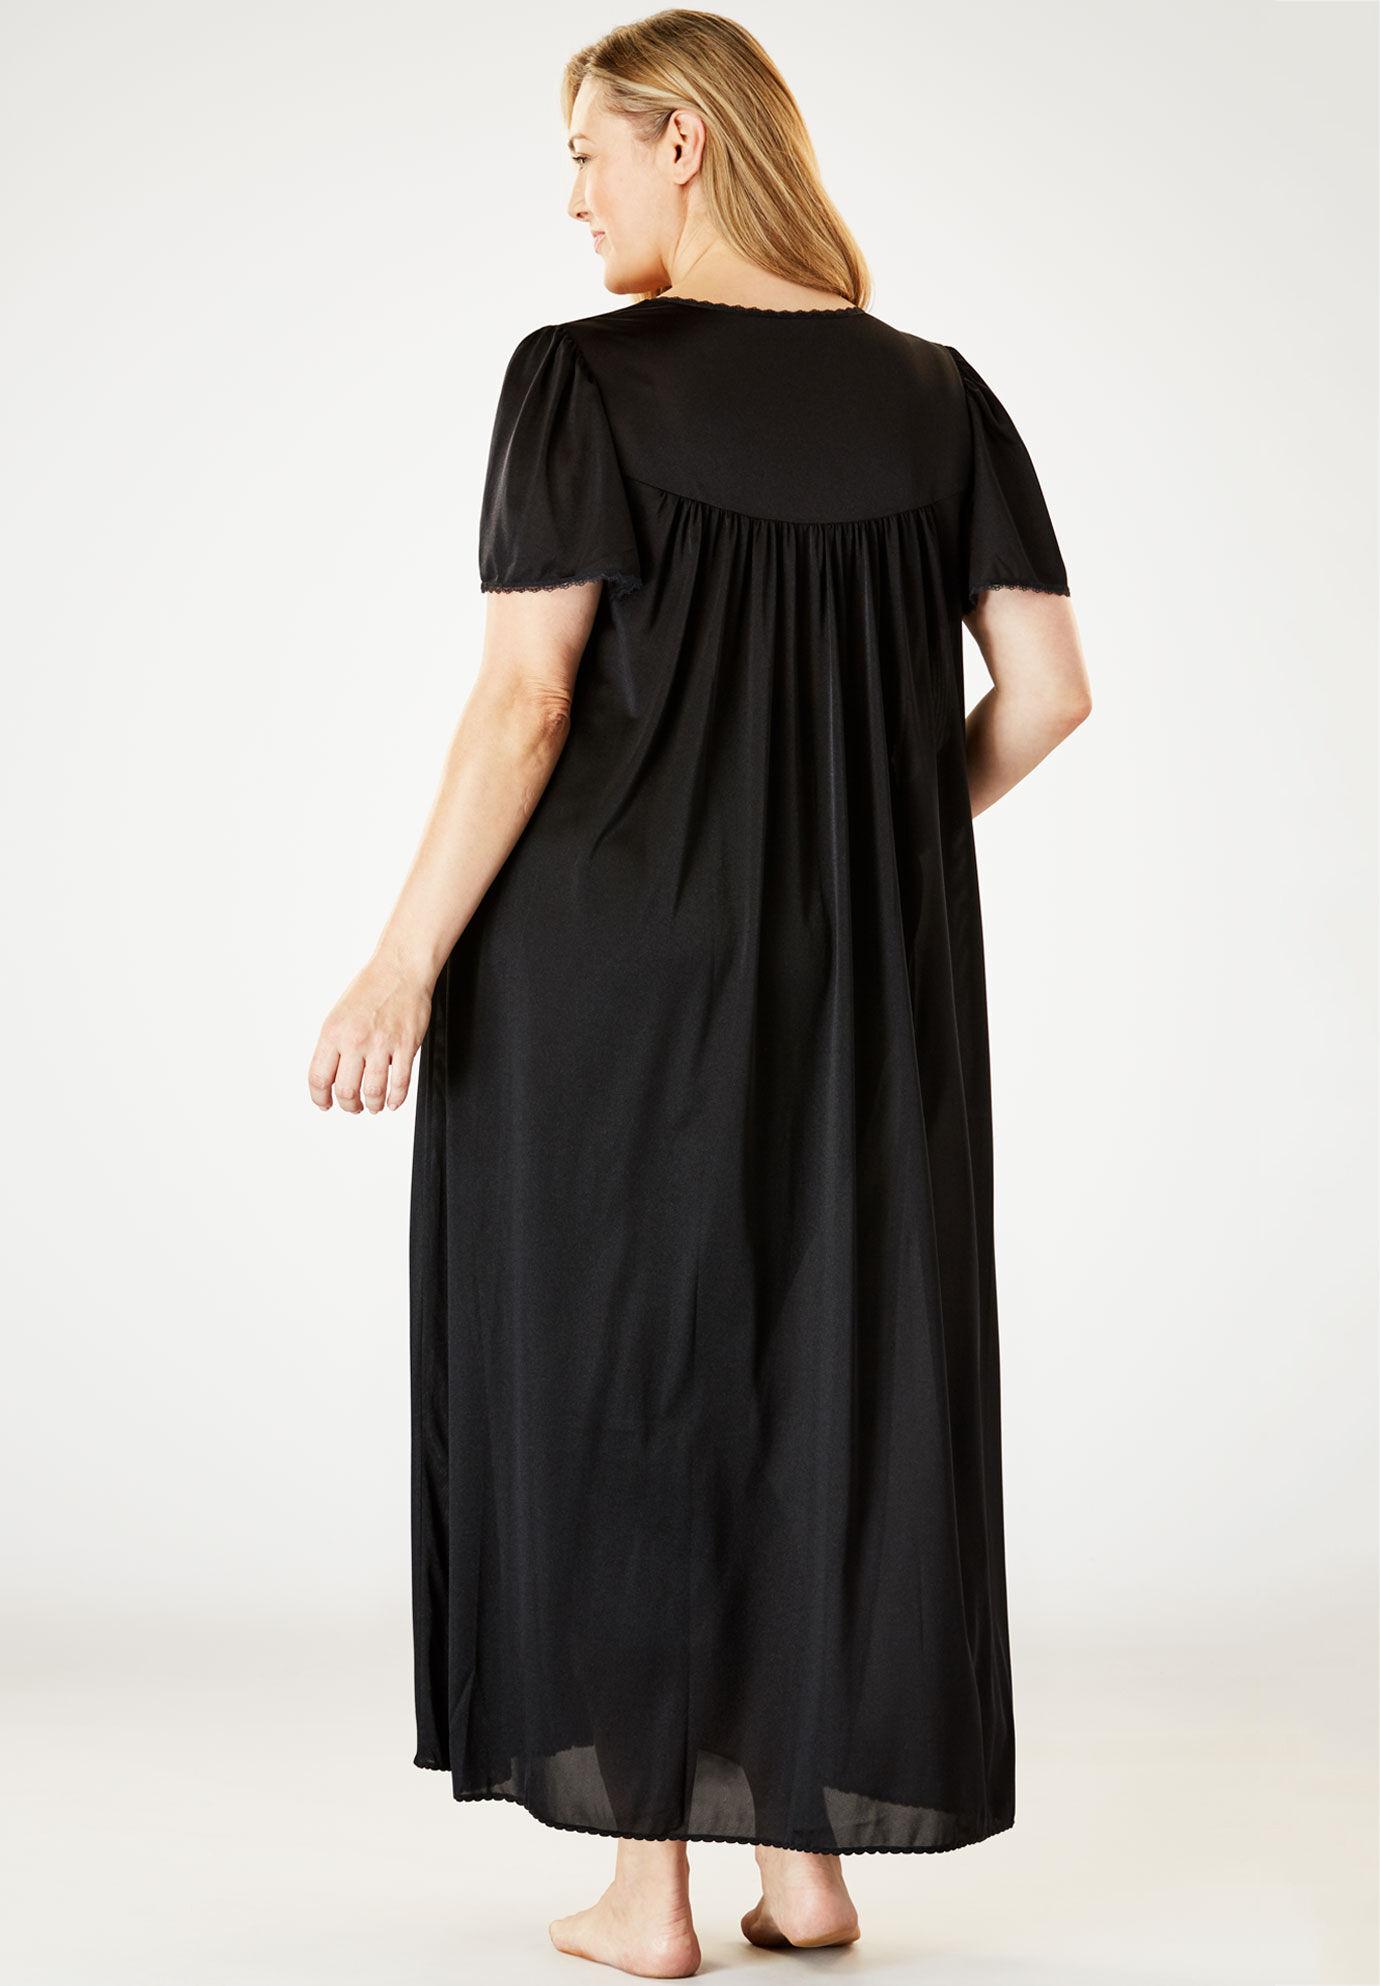 "Amoureuse BLACK Nightgown Robe  PEIGNOIR SET  42/"" Long  Sz 3X 56/"" BUST"